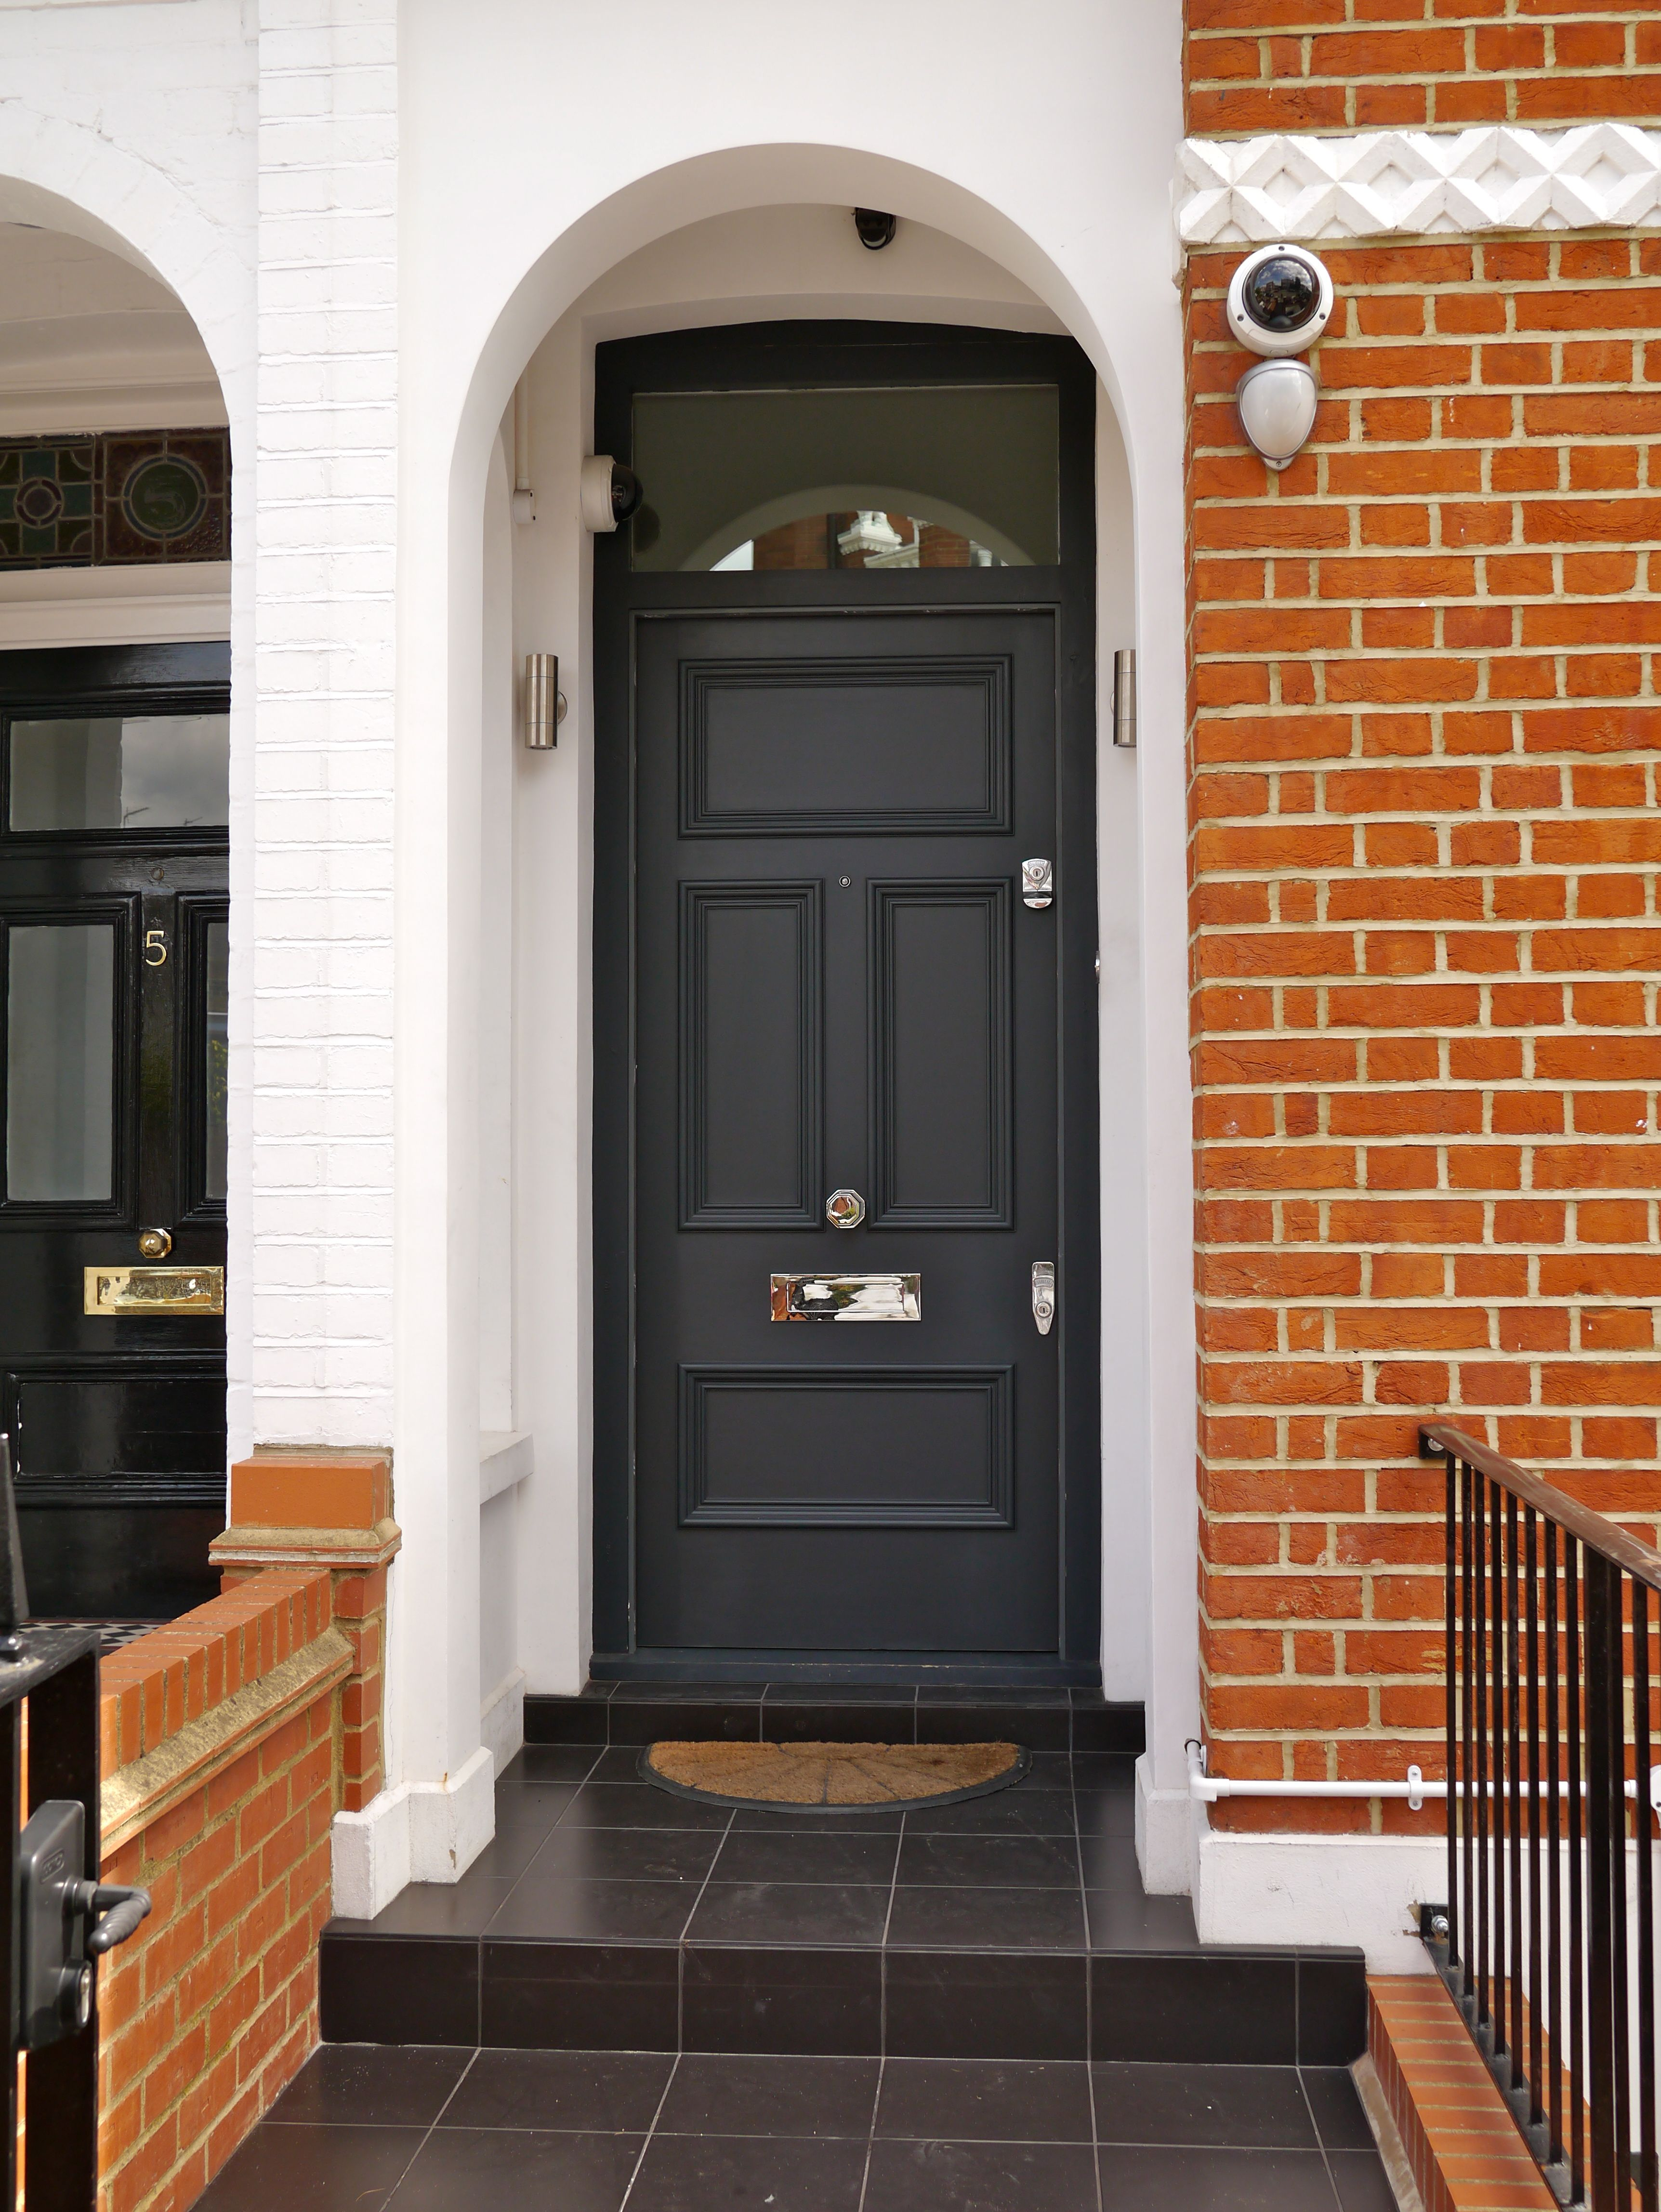 Fulham london farrow and ball railings colorful doors - Farrow and ball exterior door paint ...